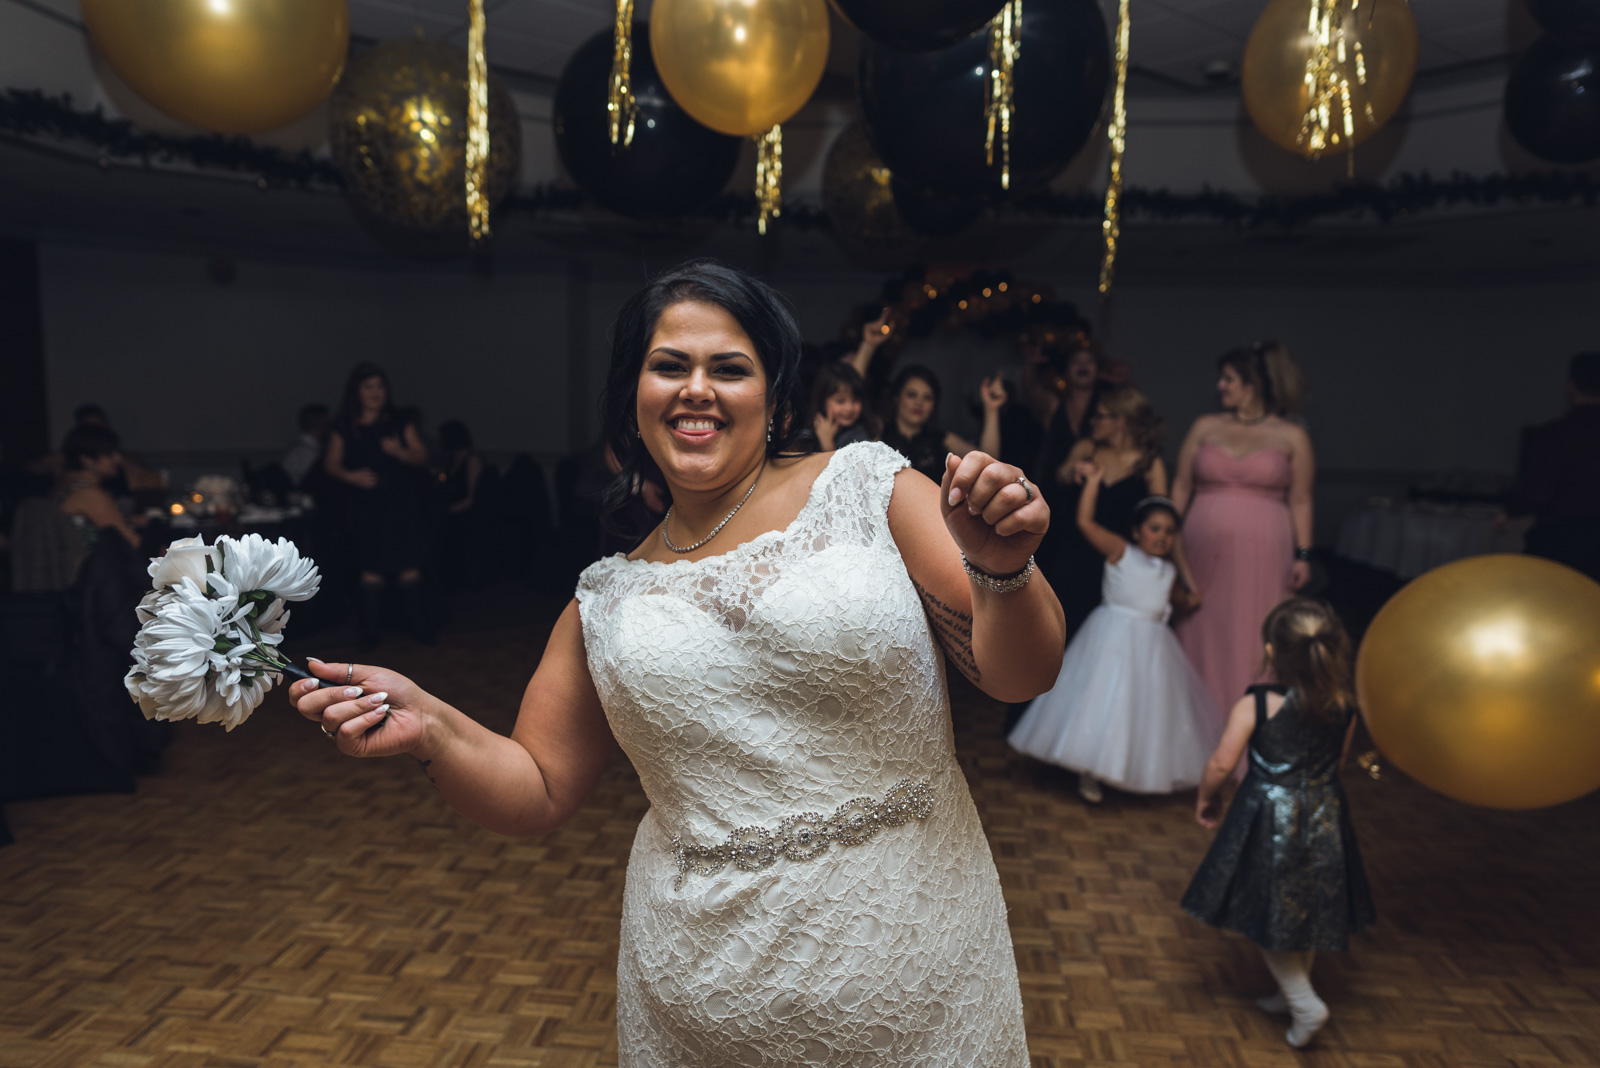 rheana-chris-wedding-blog-314.jpg